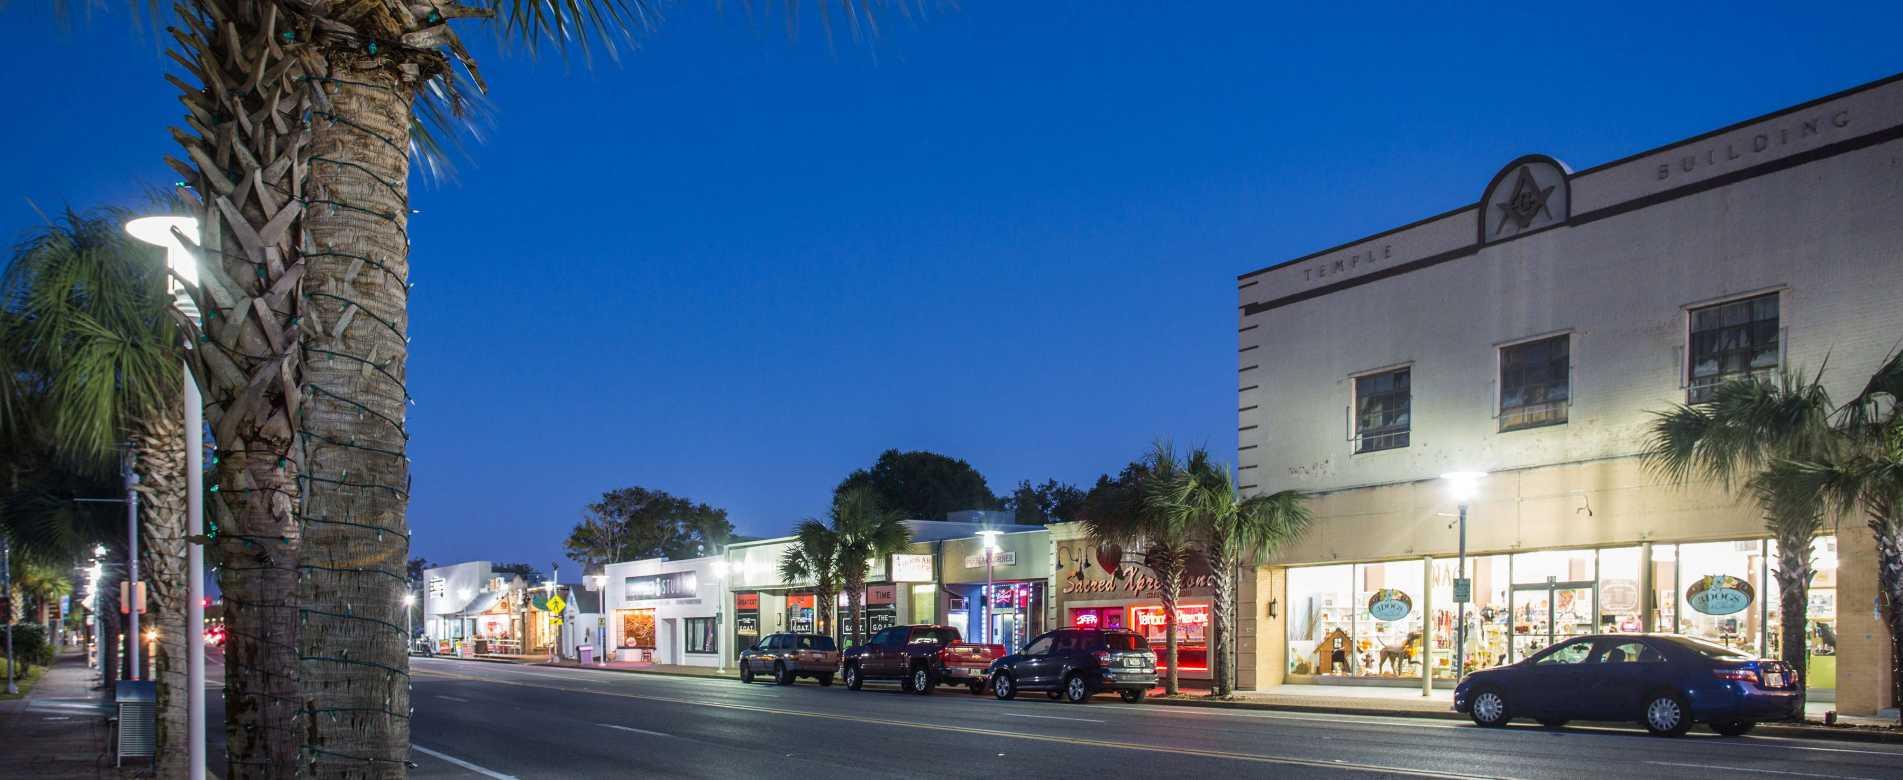 Fort Walton Beach Florida Things To